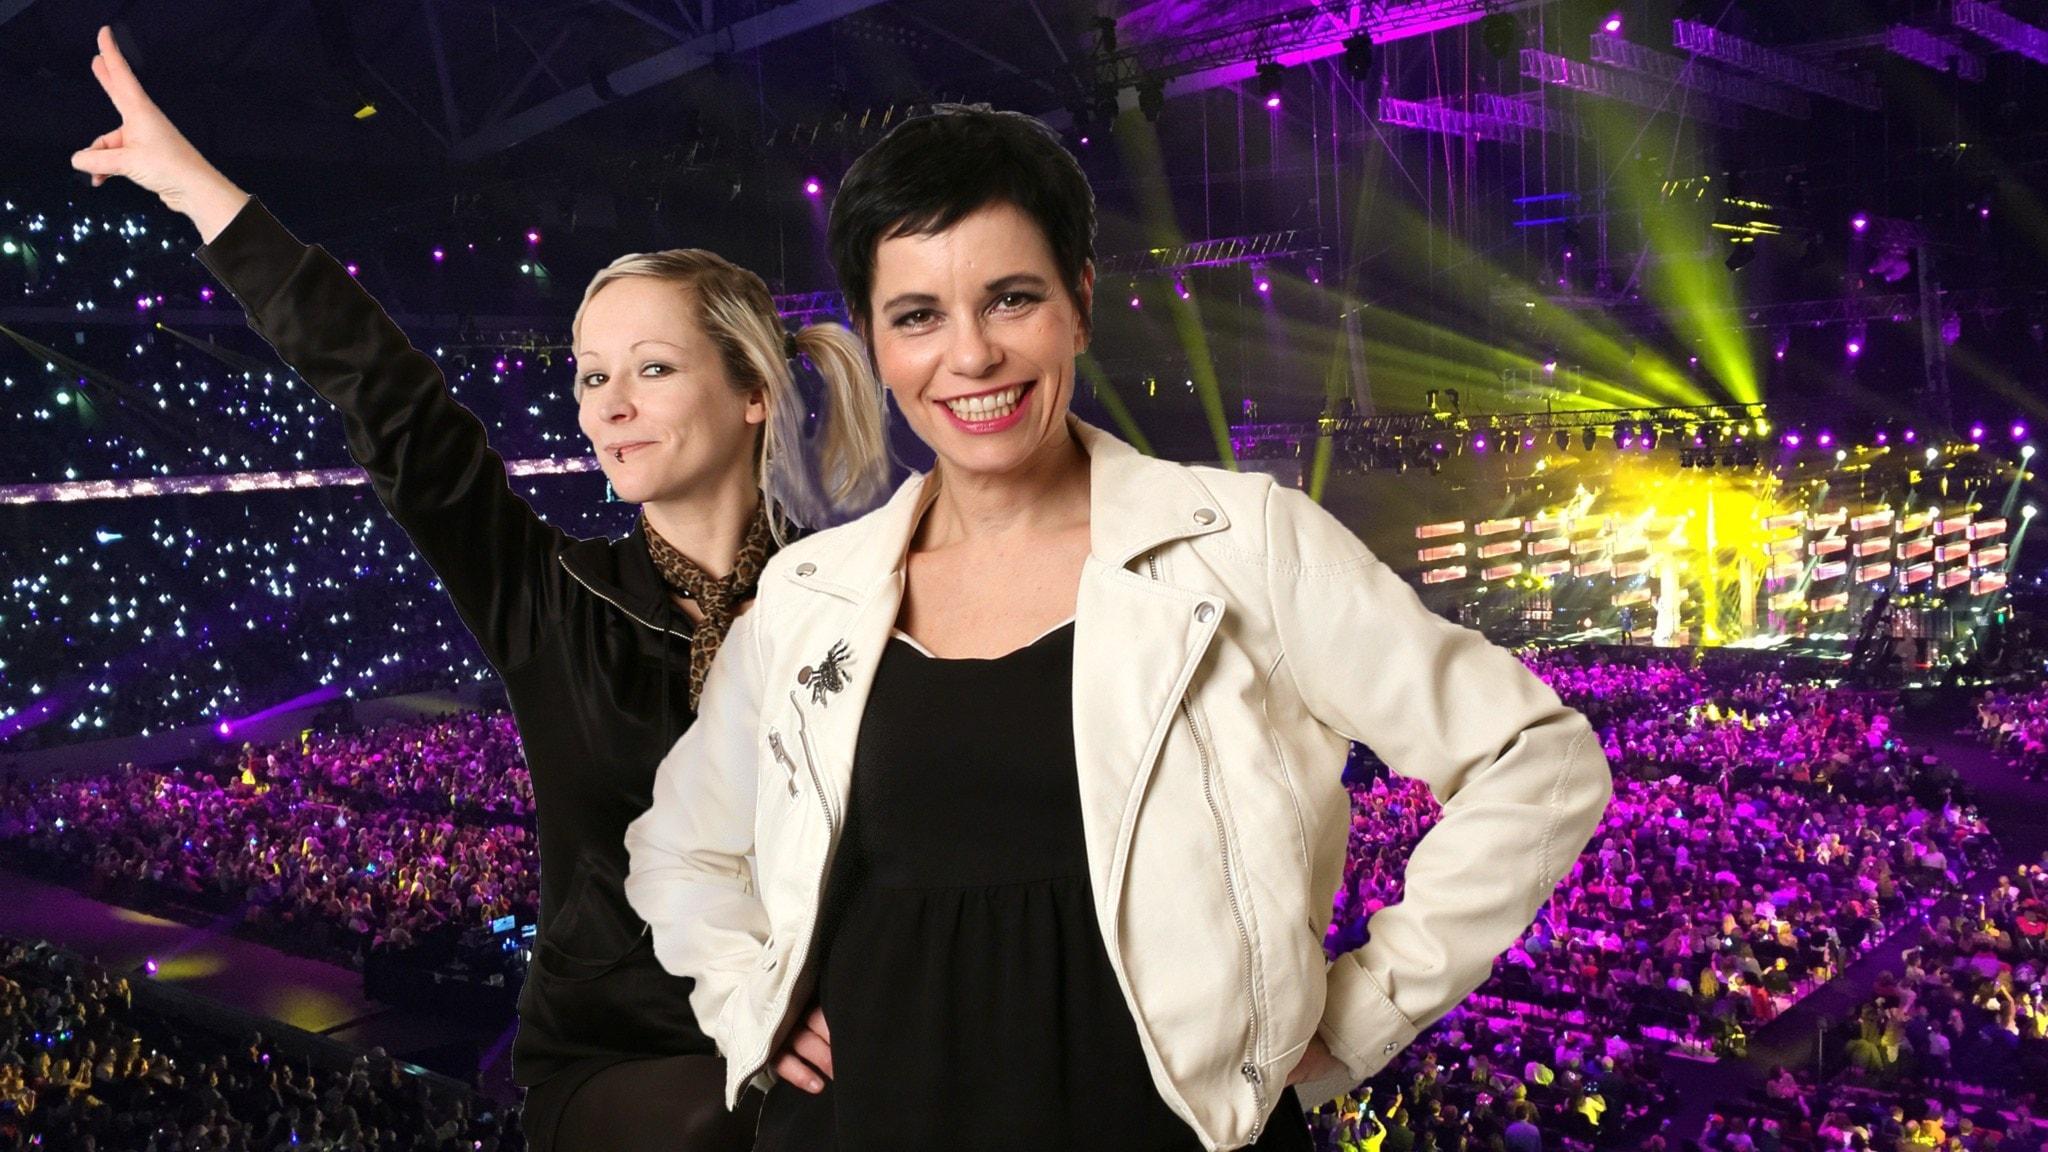 Följ finalen i Melodifestivalen direkt i P4